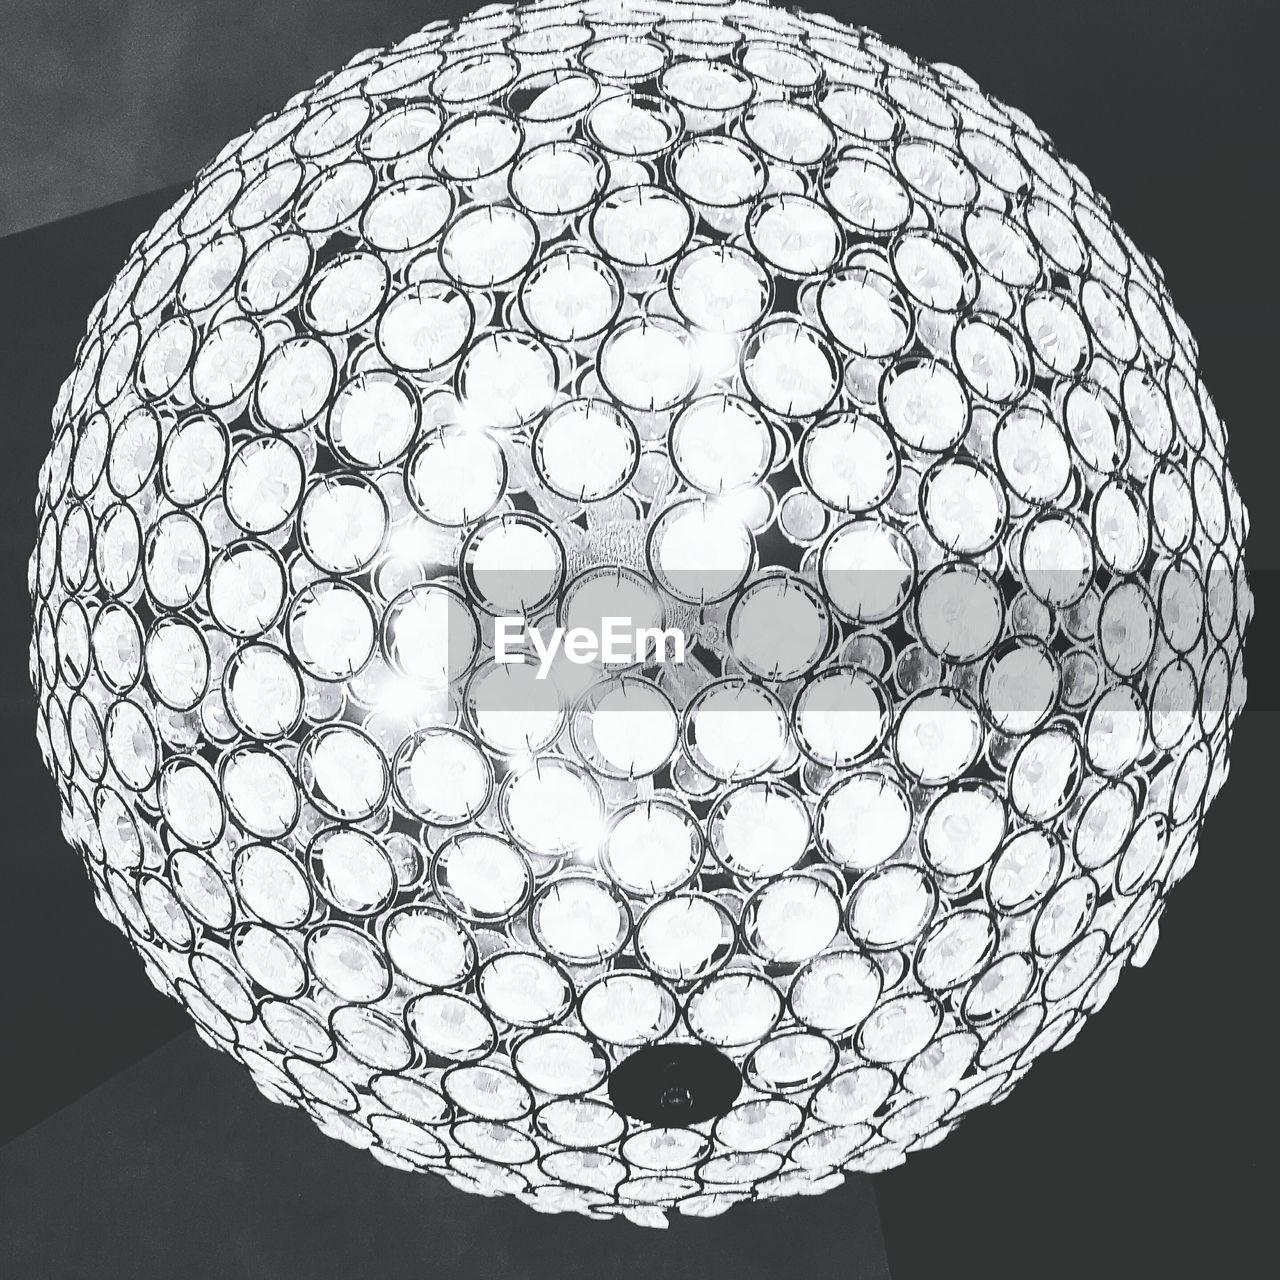 lighting equipment, indoors, no people, pattern, close-up, illuminated, day